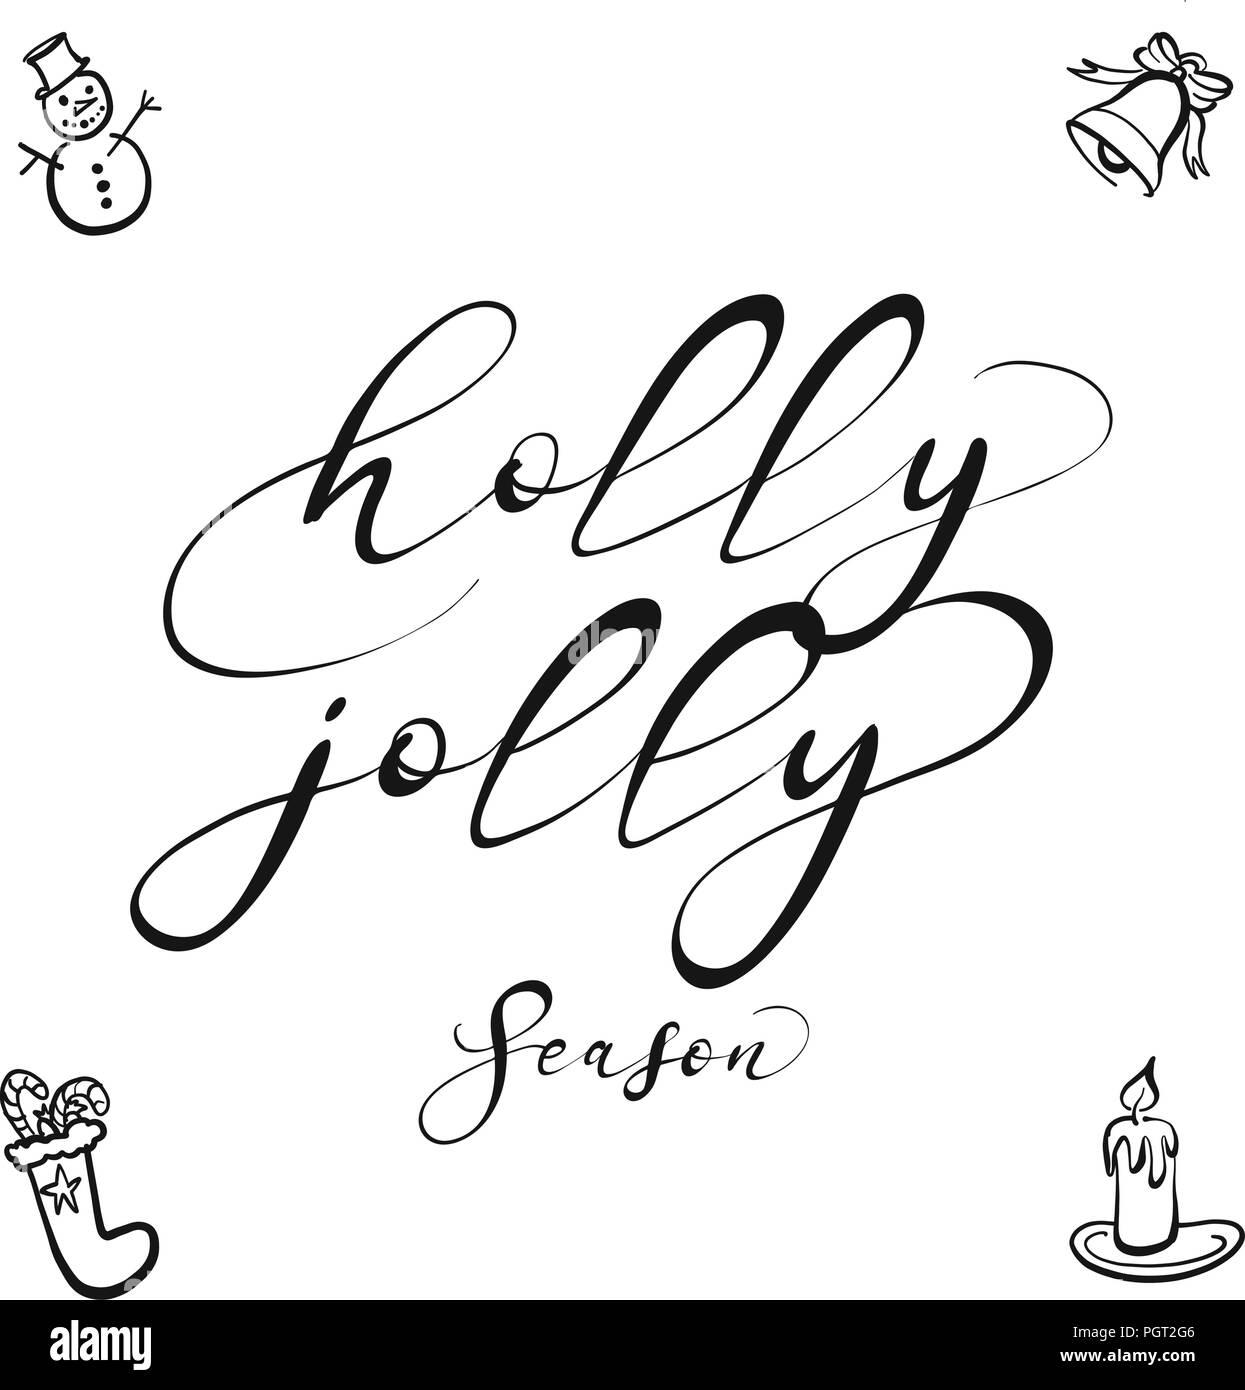 Holly jolly lettering nice seasonal calligraphic artwork for holly jolly lettering nice seasonal calligraphic artwork for greeting cards hand drawn vector sketch altavistaventures Choice Image